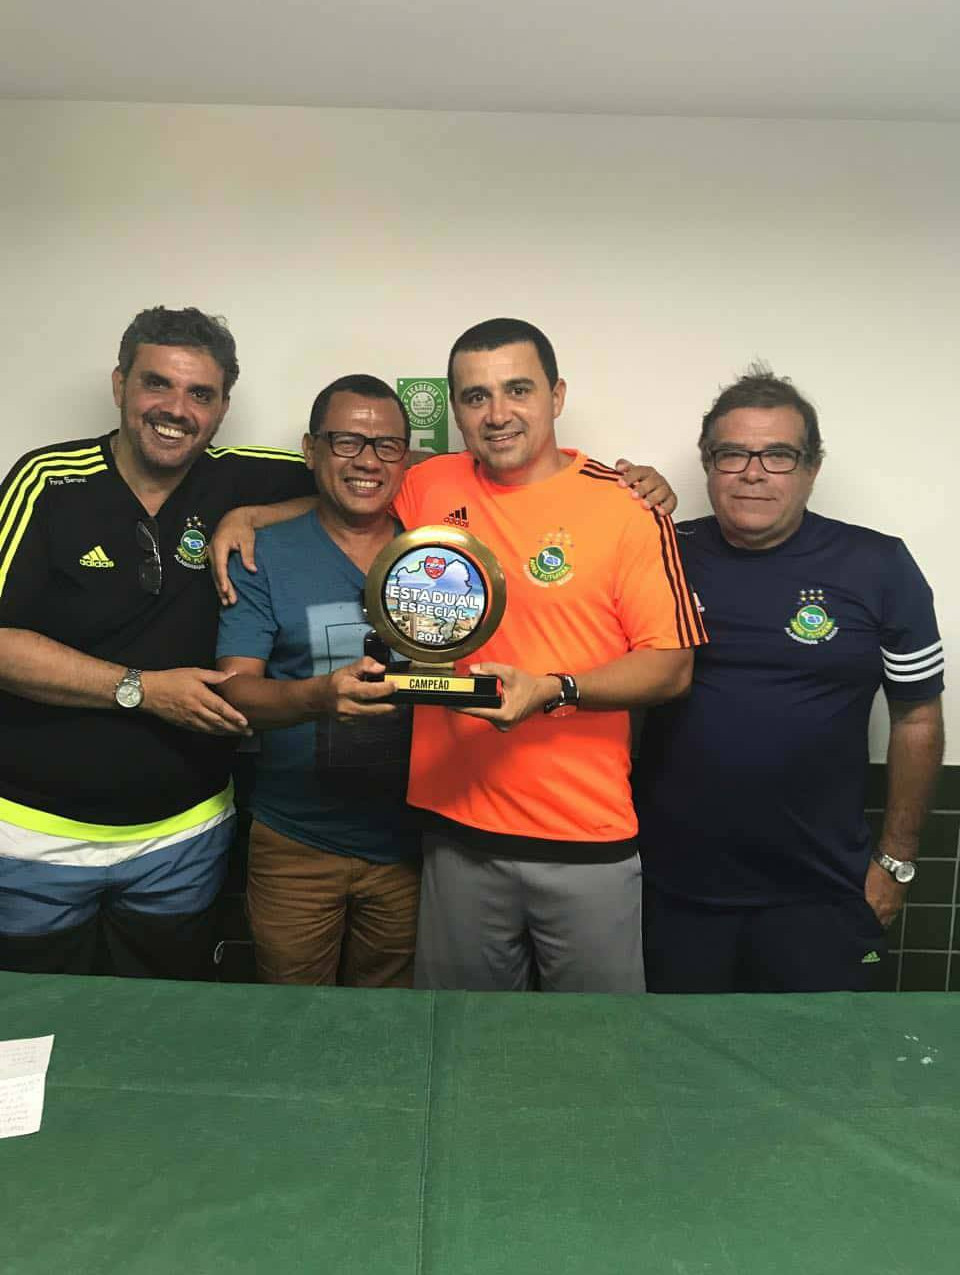 Danilo - Campeão estadual especial 2017